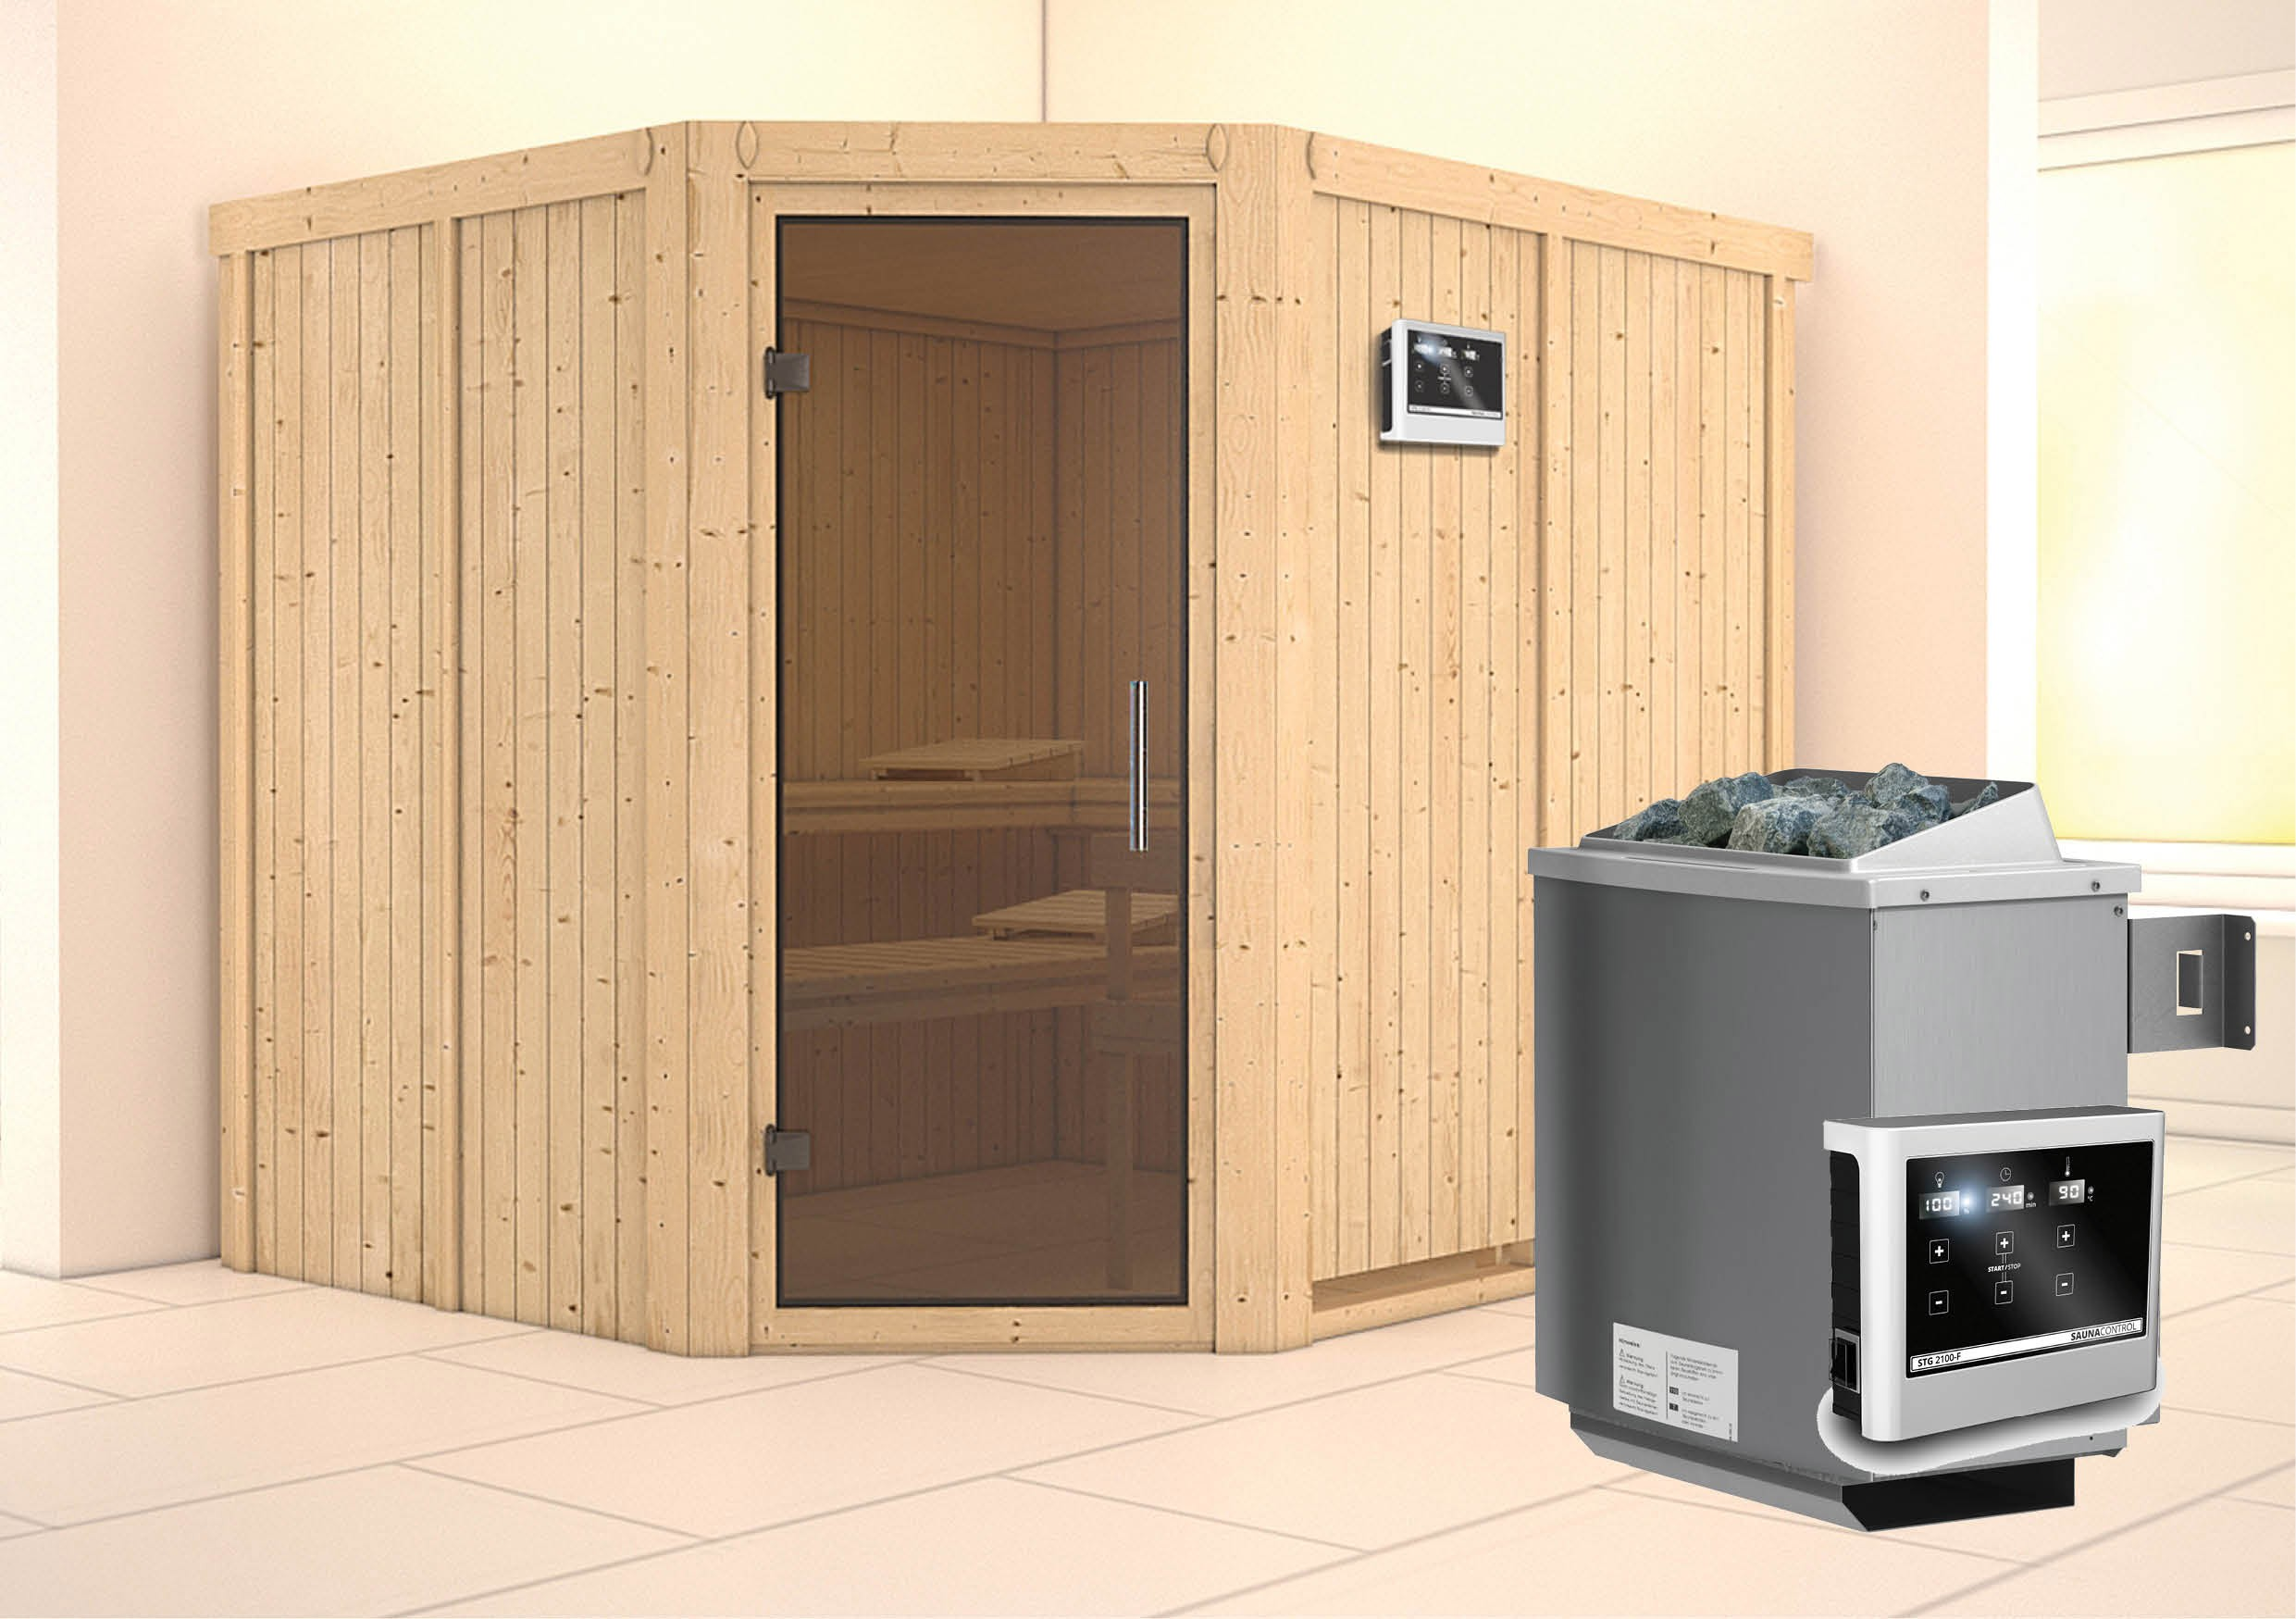 Karibu Sauna Malin 68mm Ofen 9kW extern Tür modern Bild 1